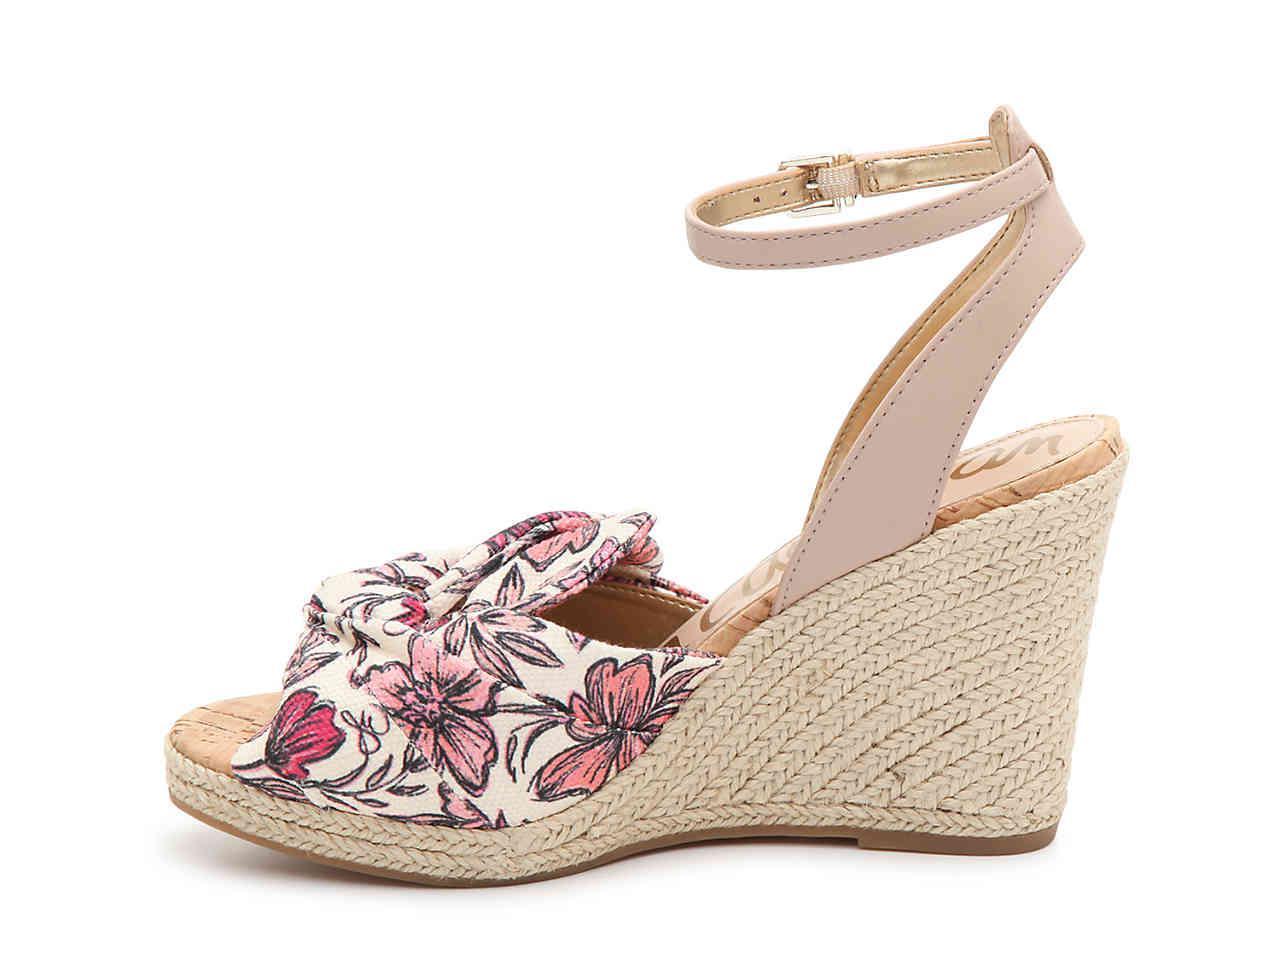 c4f0fcb364f Women's Pink Aubrey Wedge Sandal